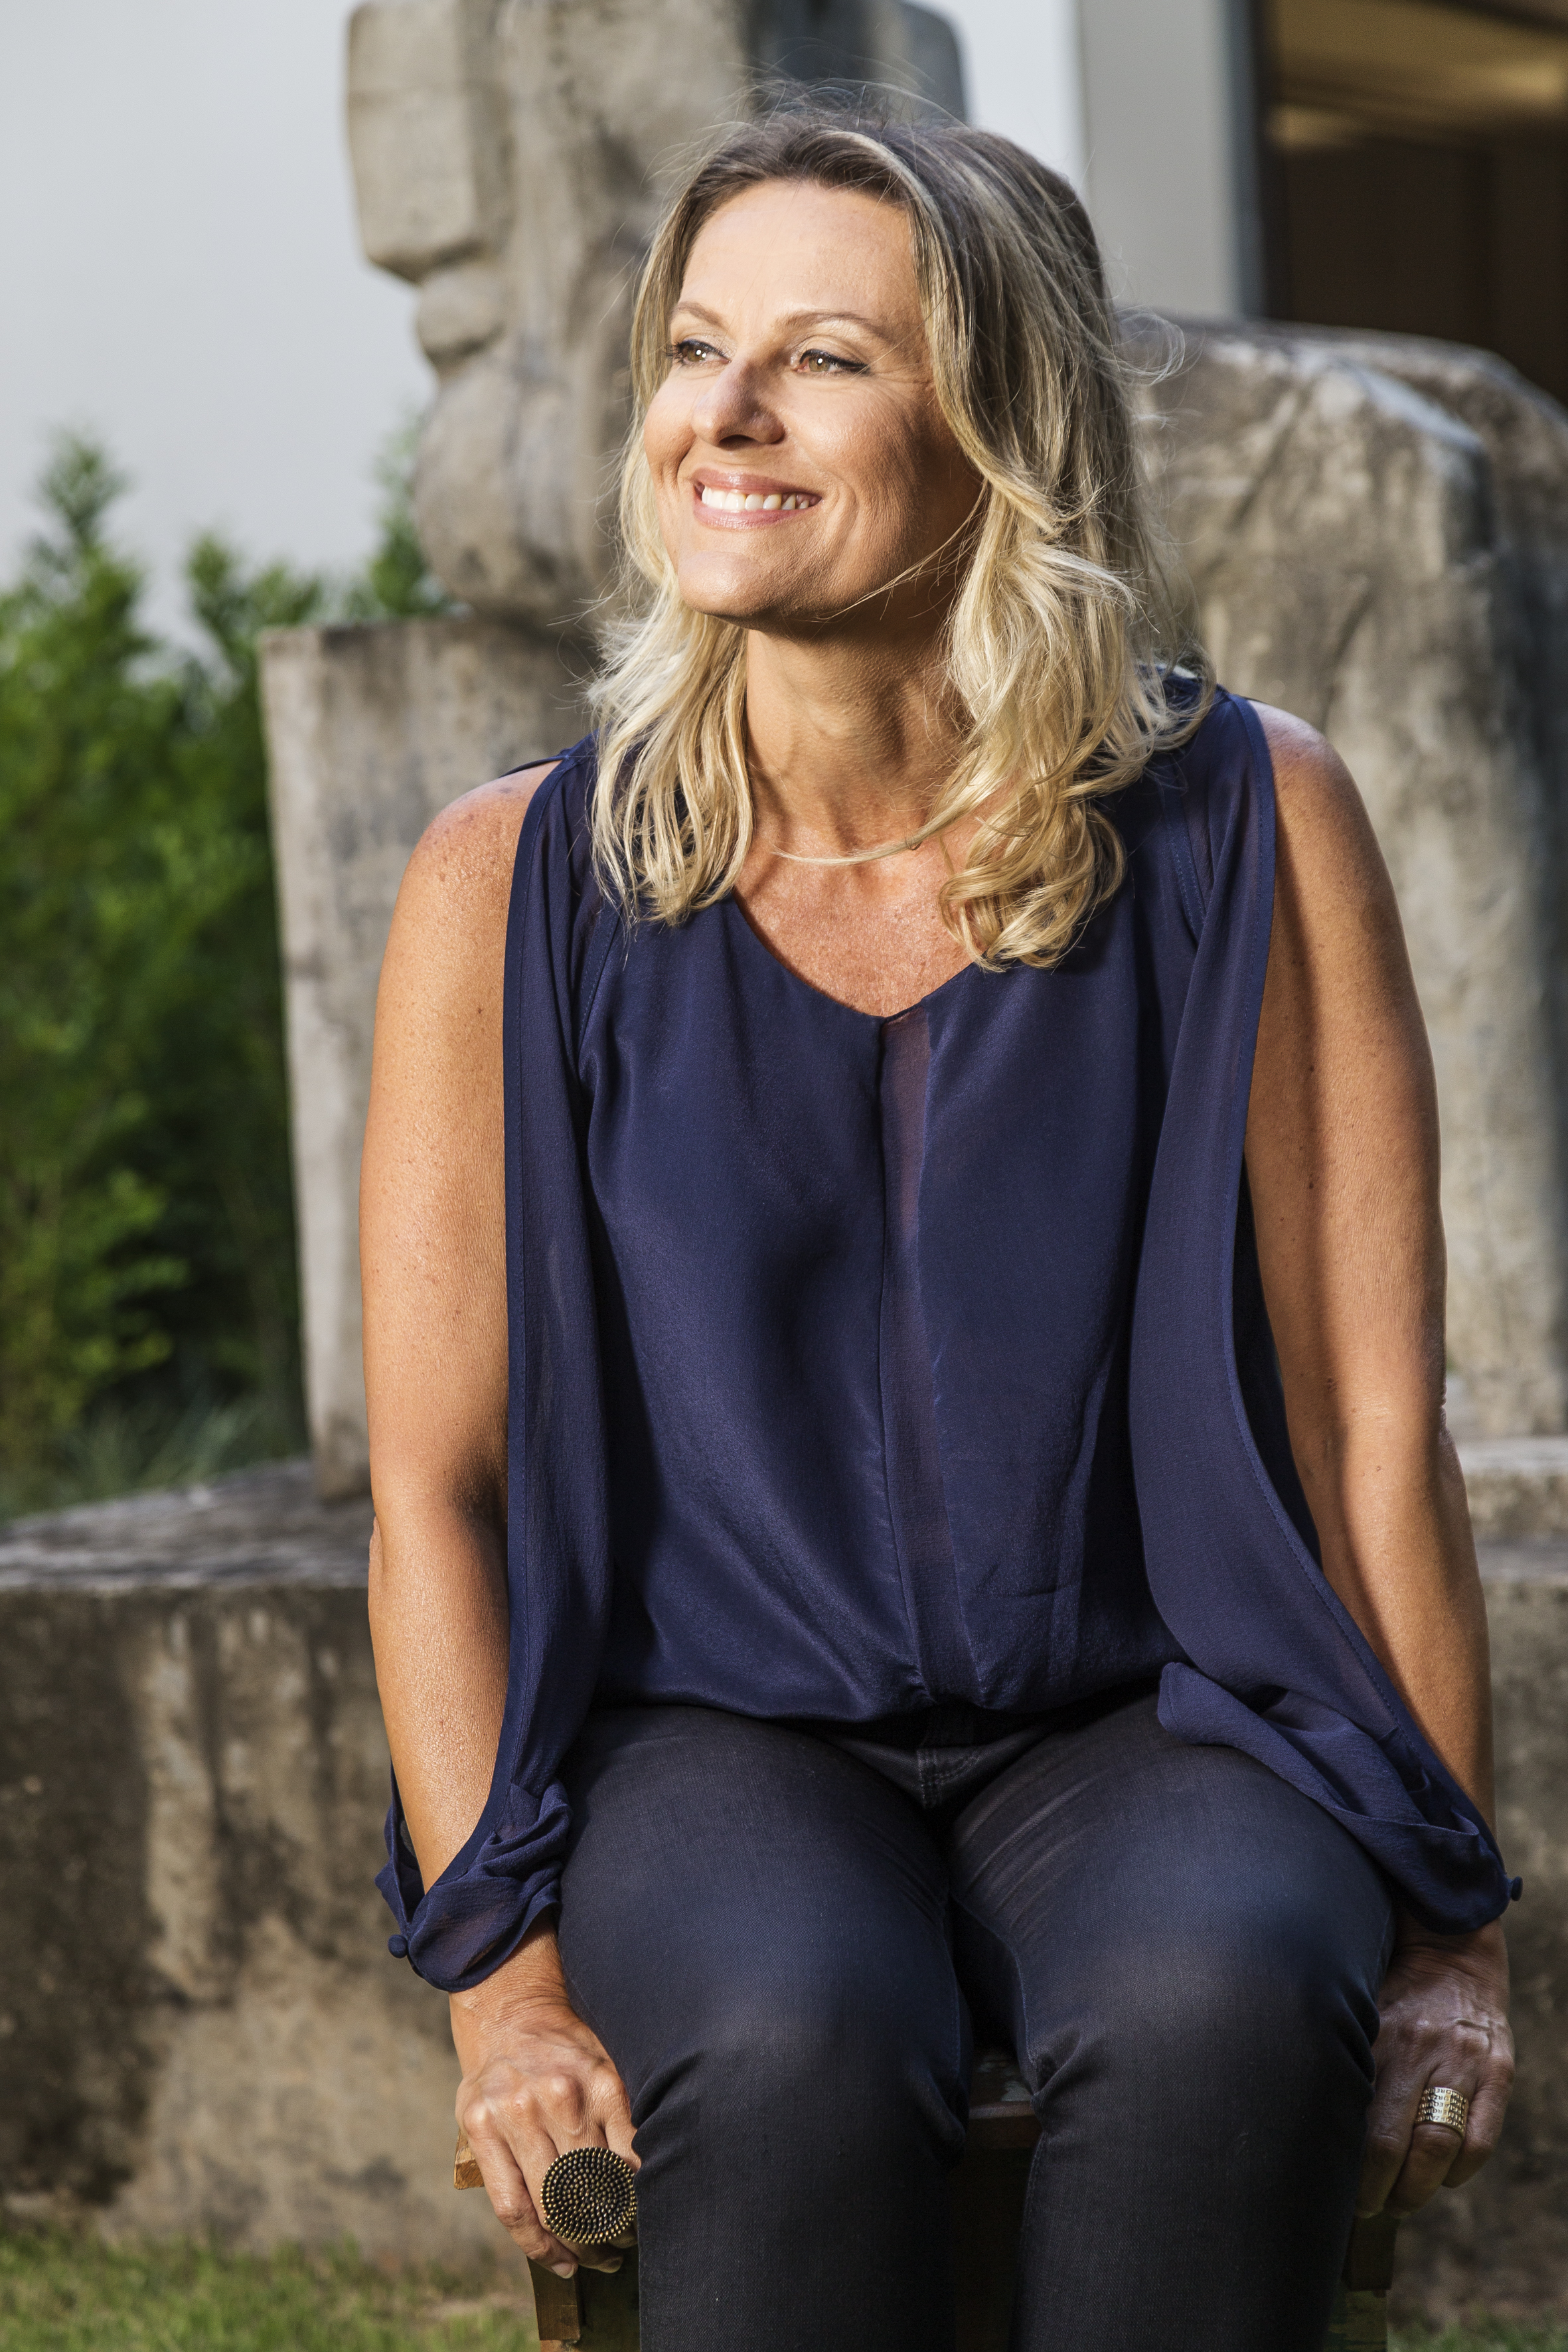 Simone Bobsin